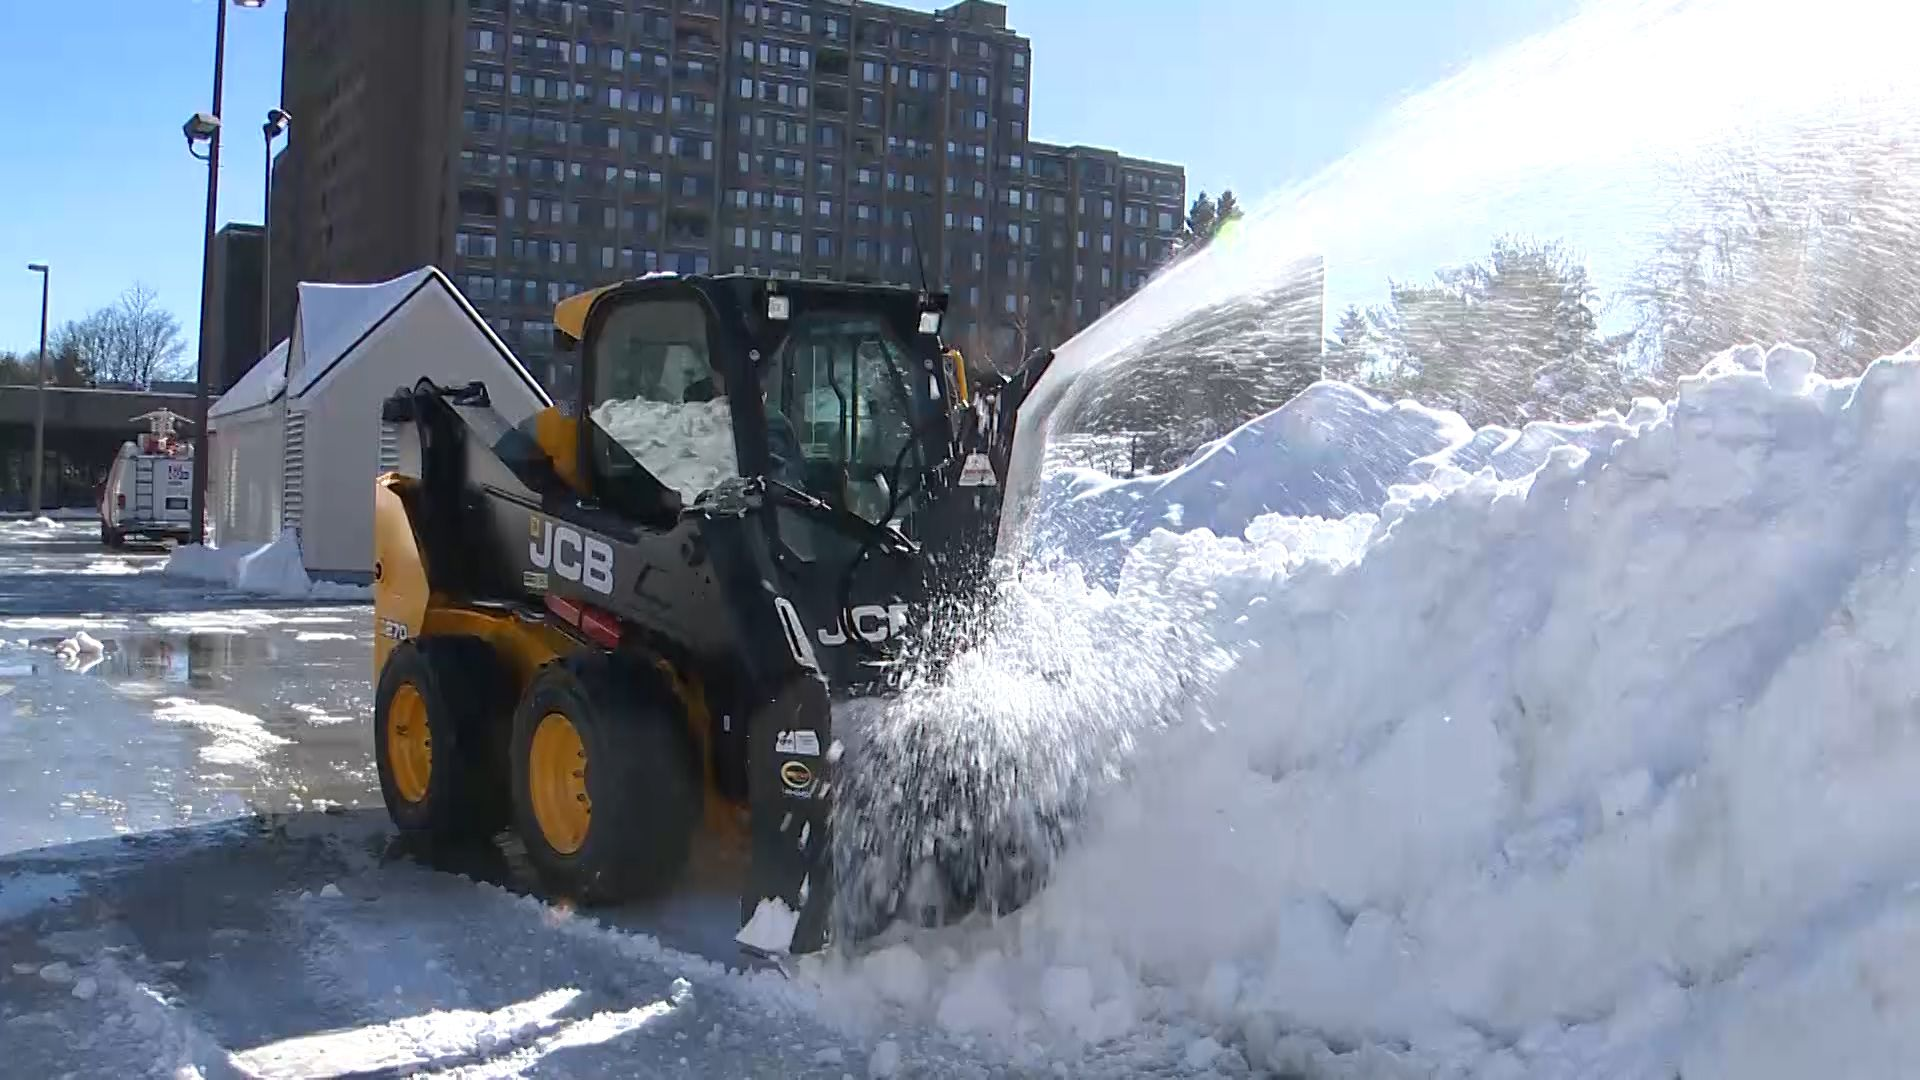 news.yahoo.com: Snowy February creating problems for Massachusetts communities